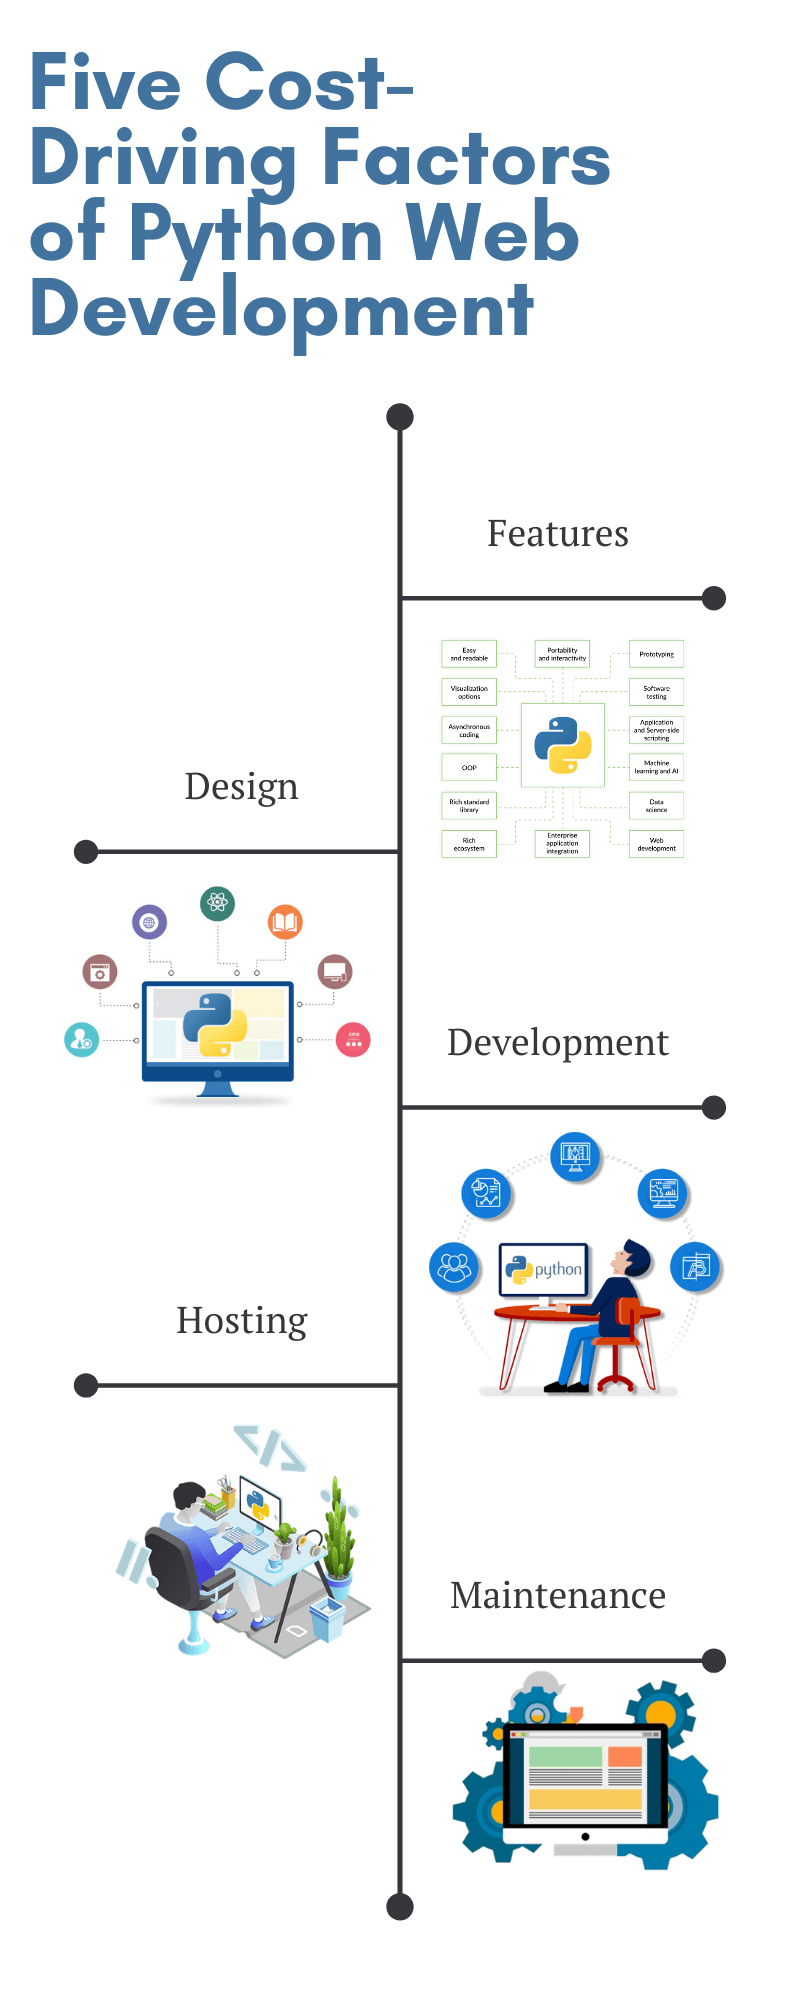 Five Cost-Driving Factors of Python-Web-Development